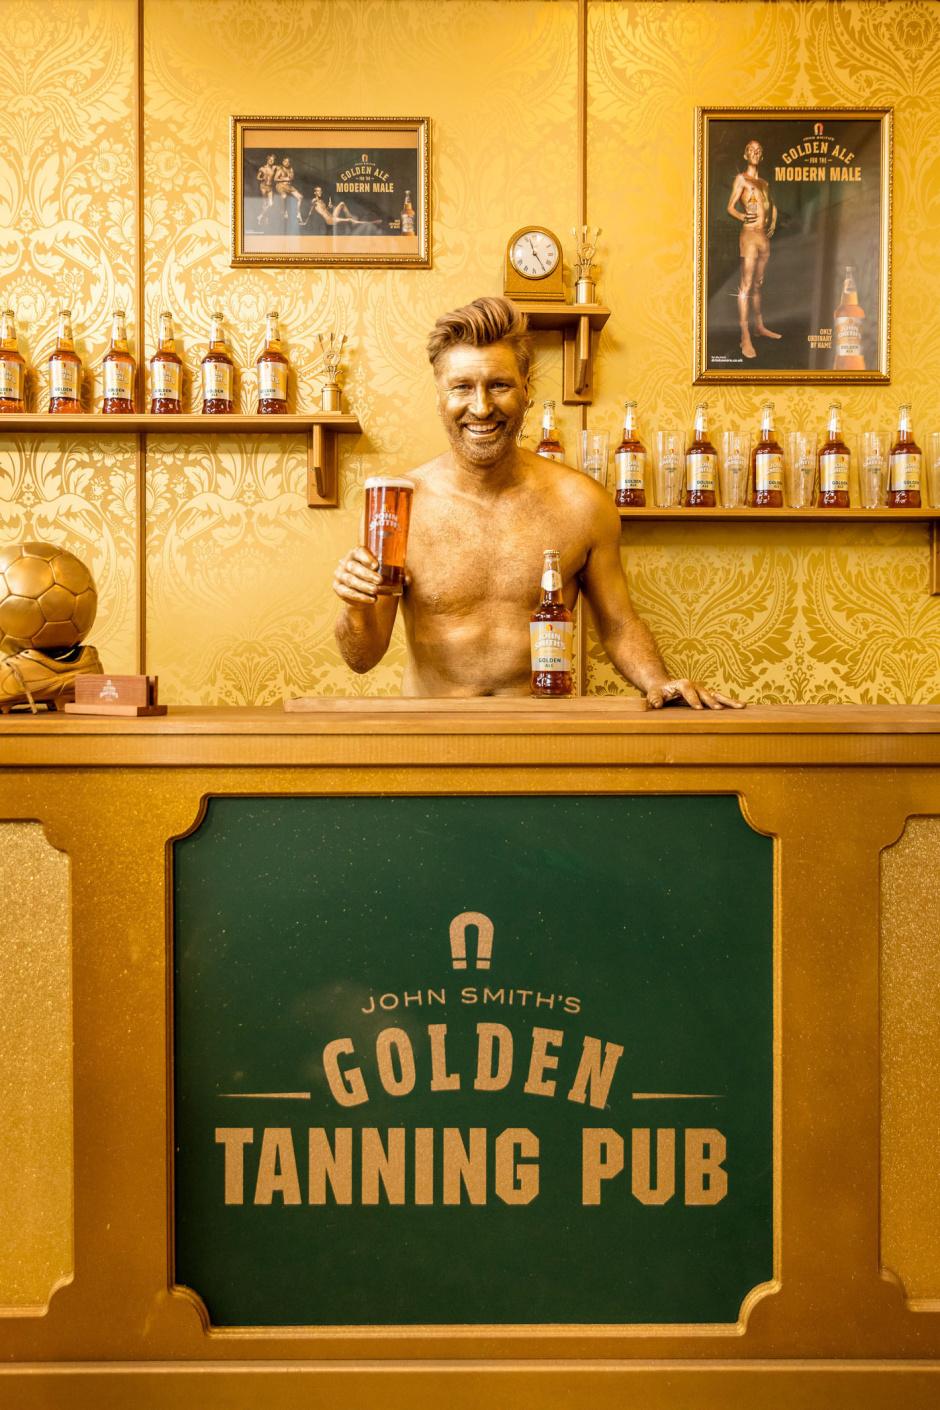 Golden tanning pub cow pr for Acapulco golden tans salon